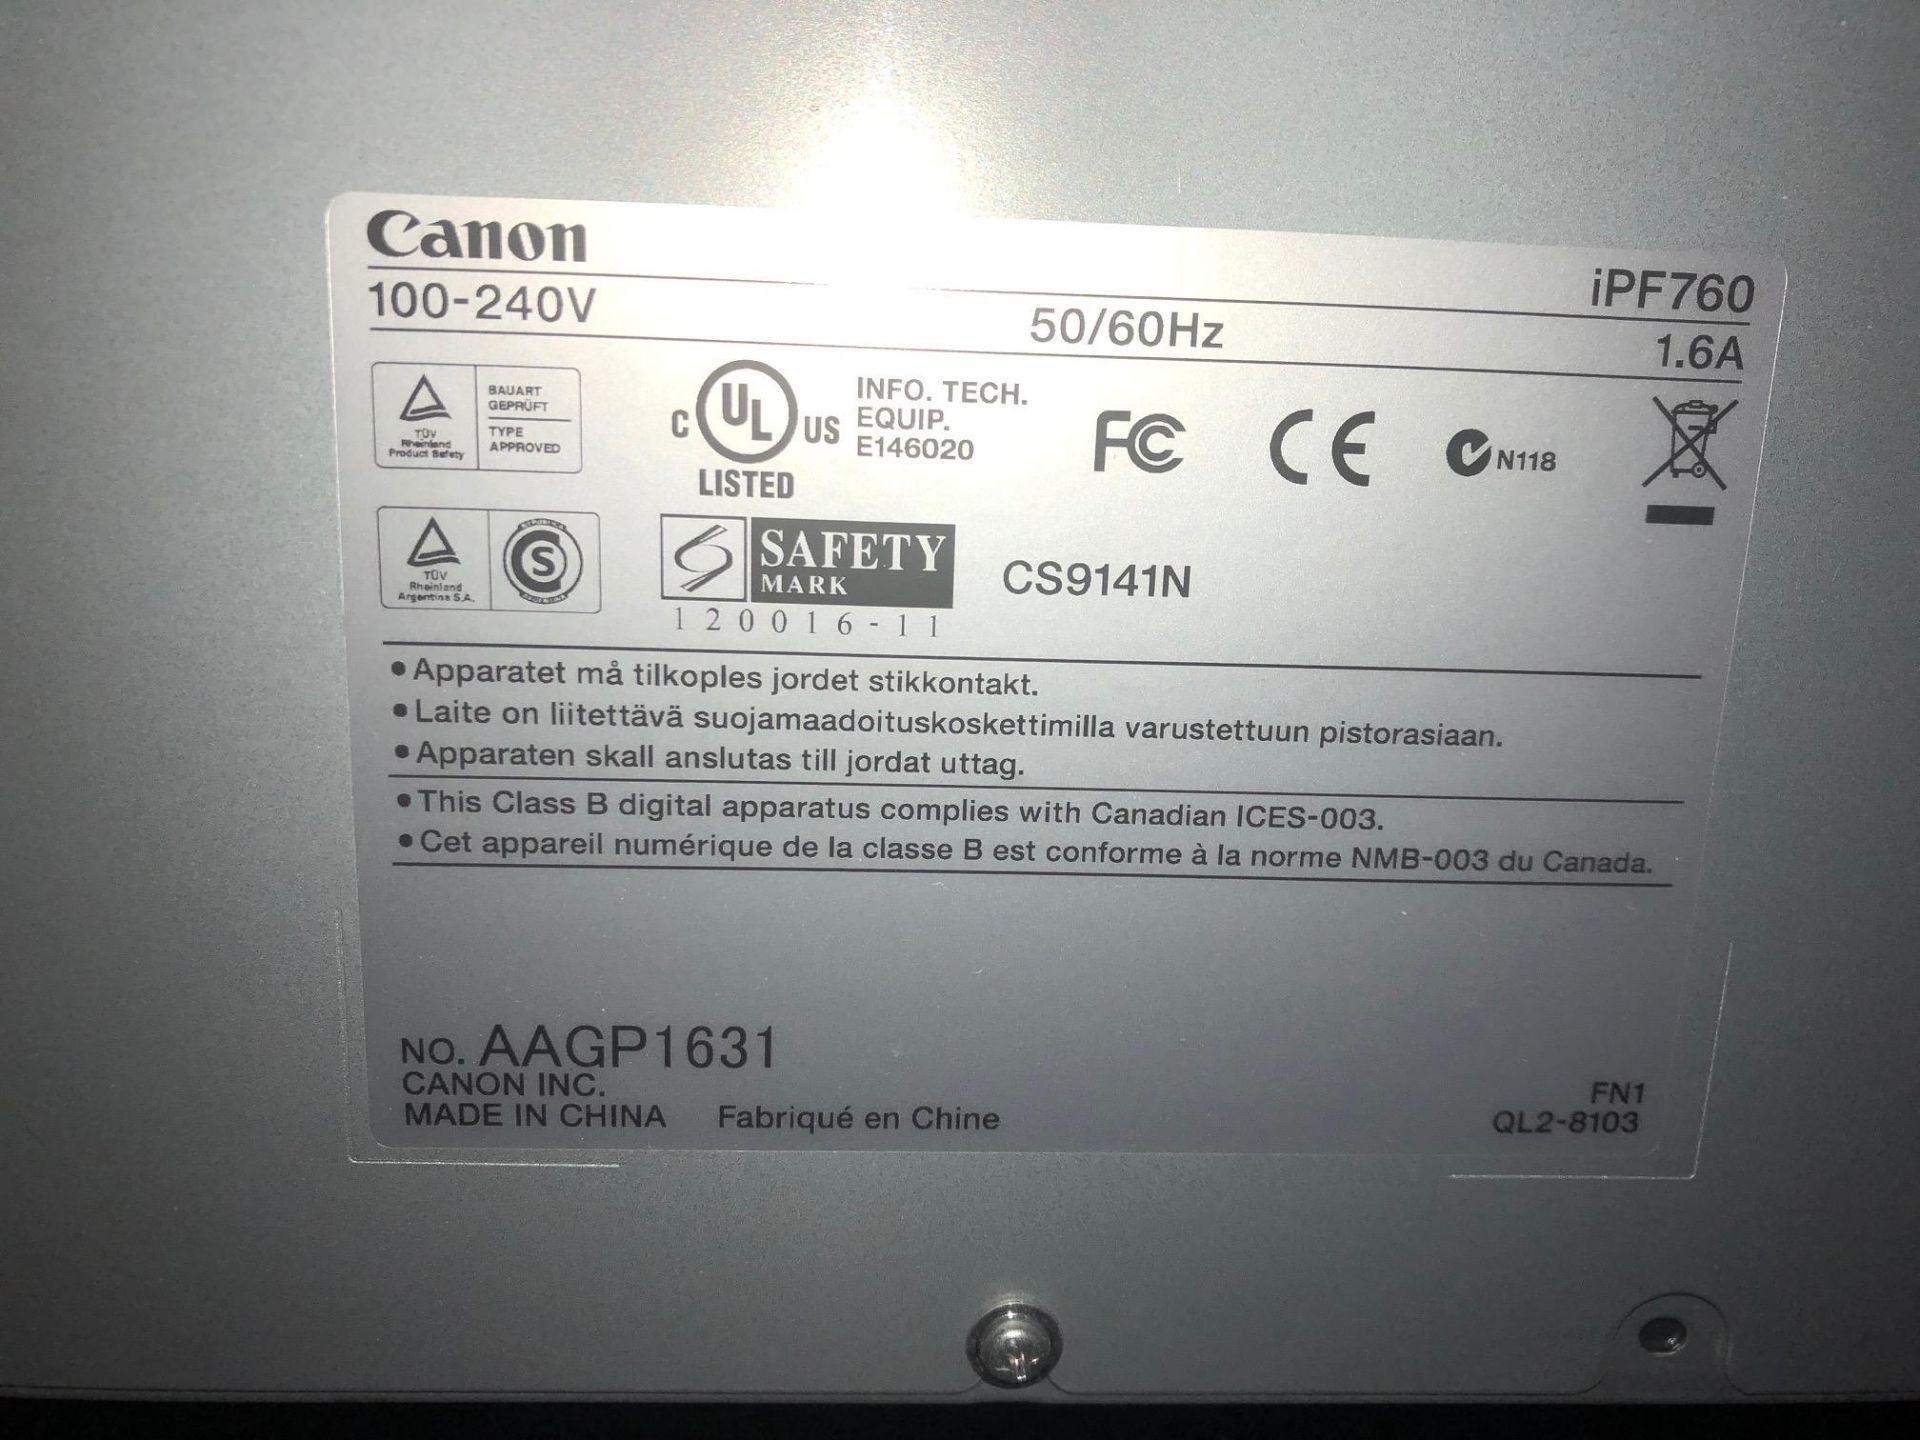 Lot 383 - Canon imagePROGRAF 760